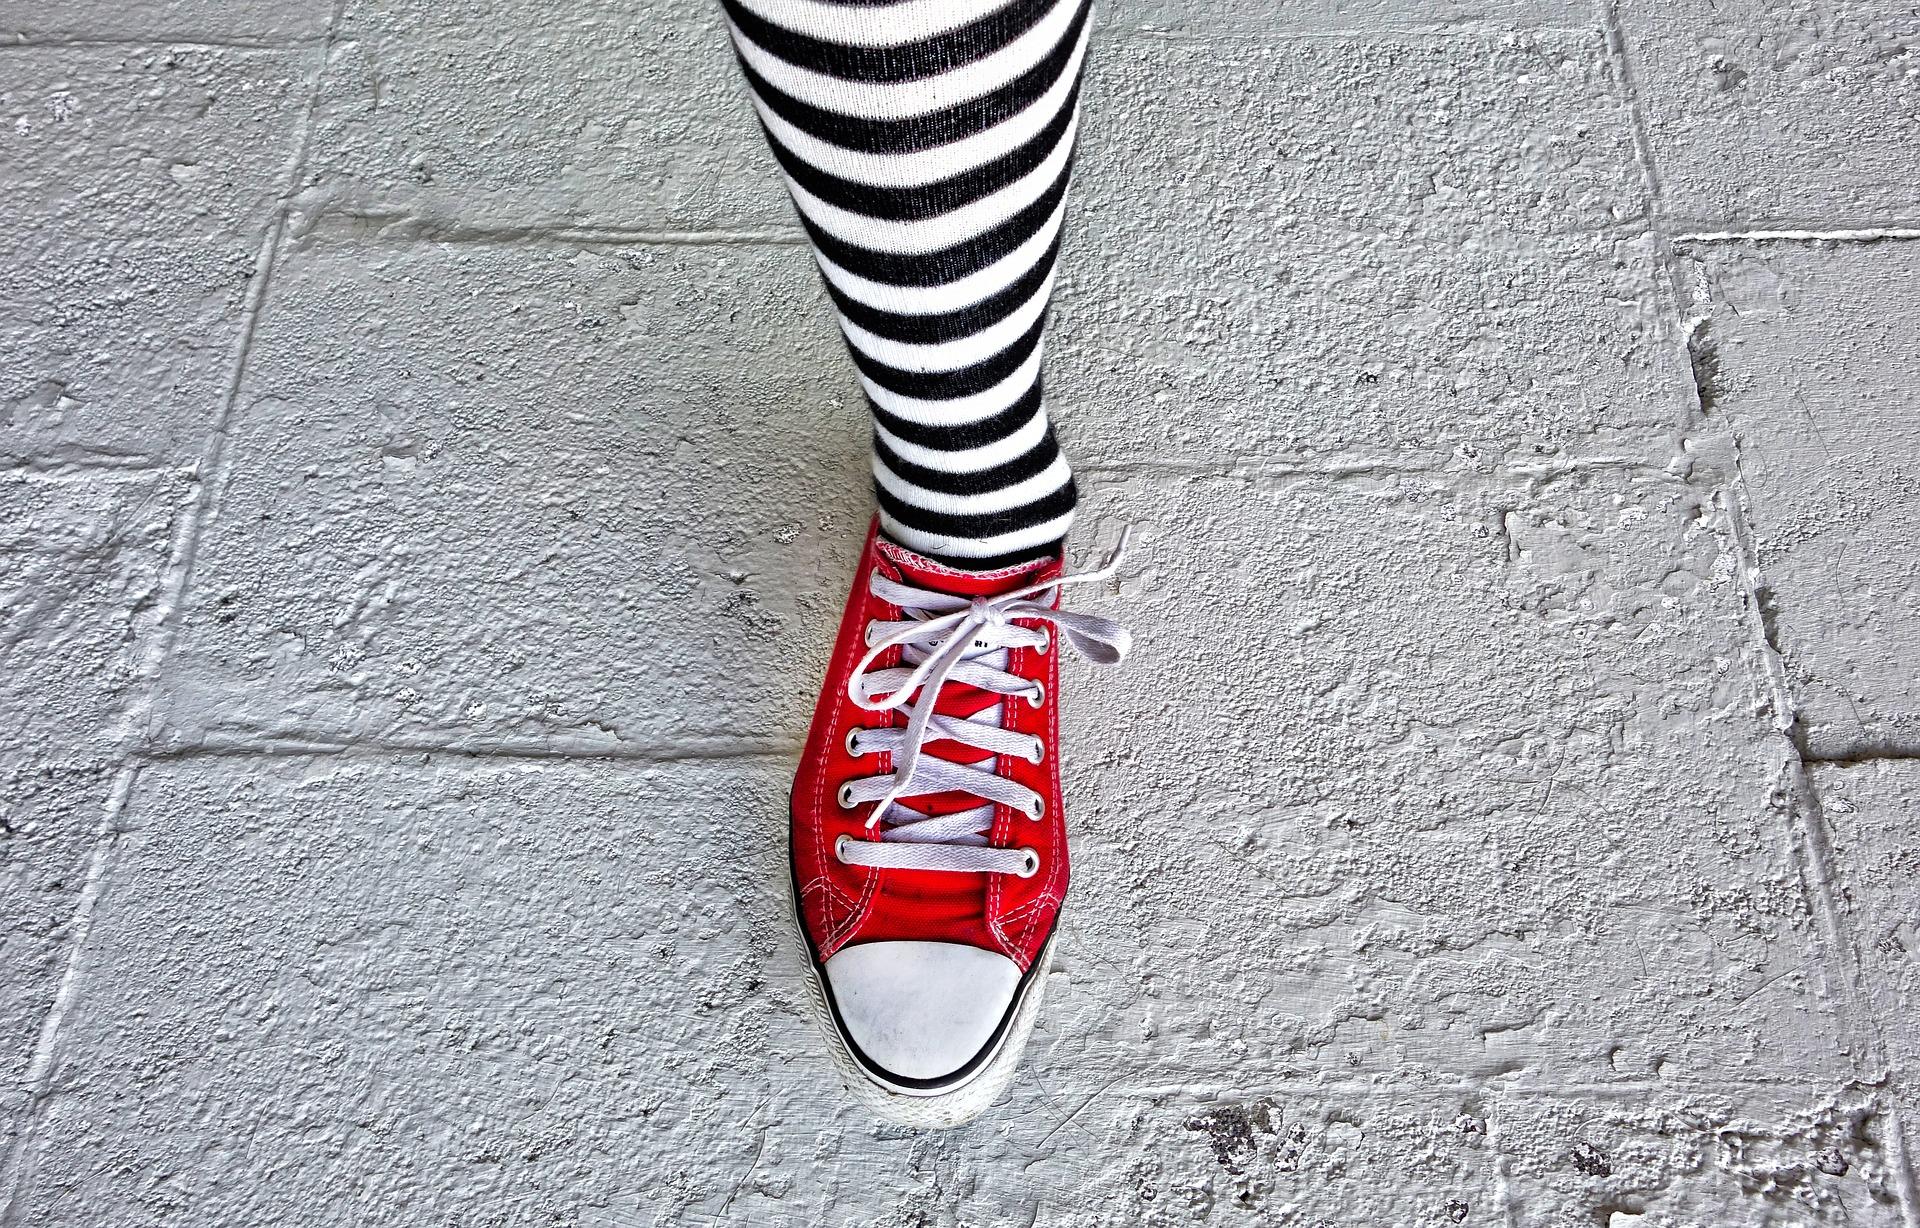 00ccb36a41f Cheap Knee High Socks - Where to Buy Cheap Knee High Socks